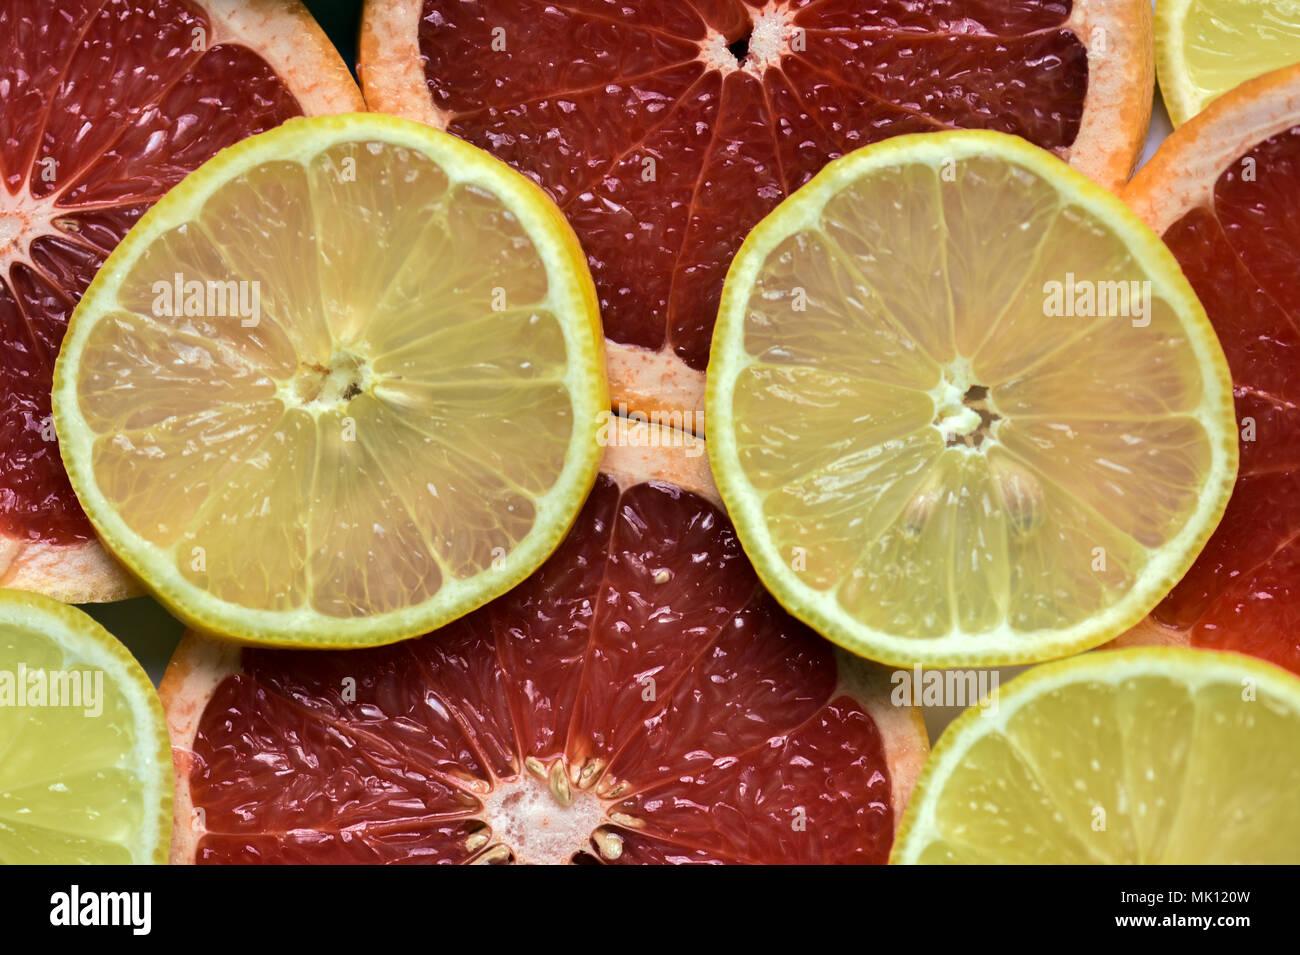 Citrus: Grapefruit and Lemons - Stock Image